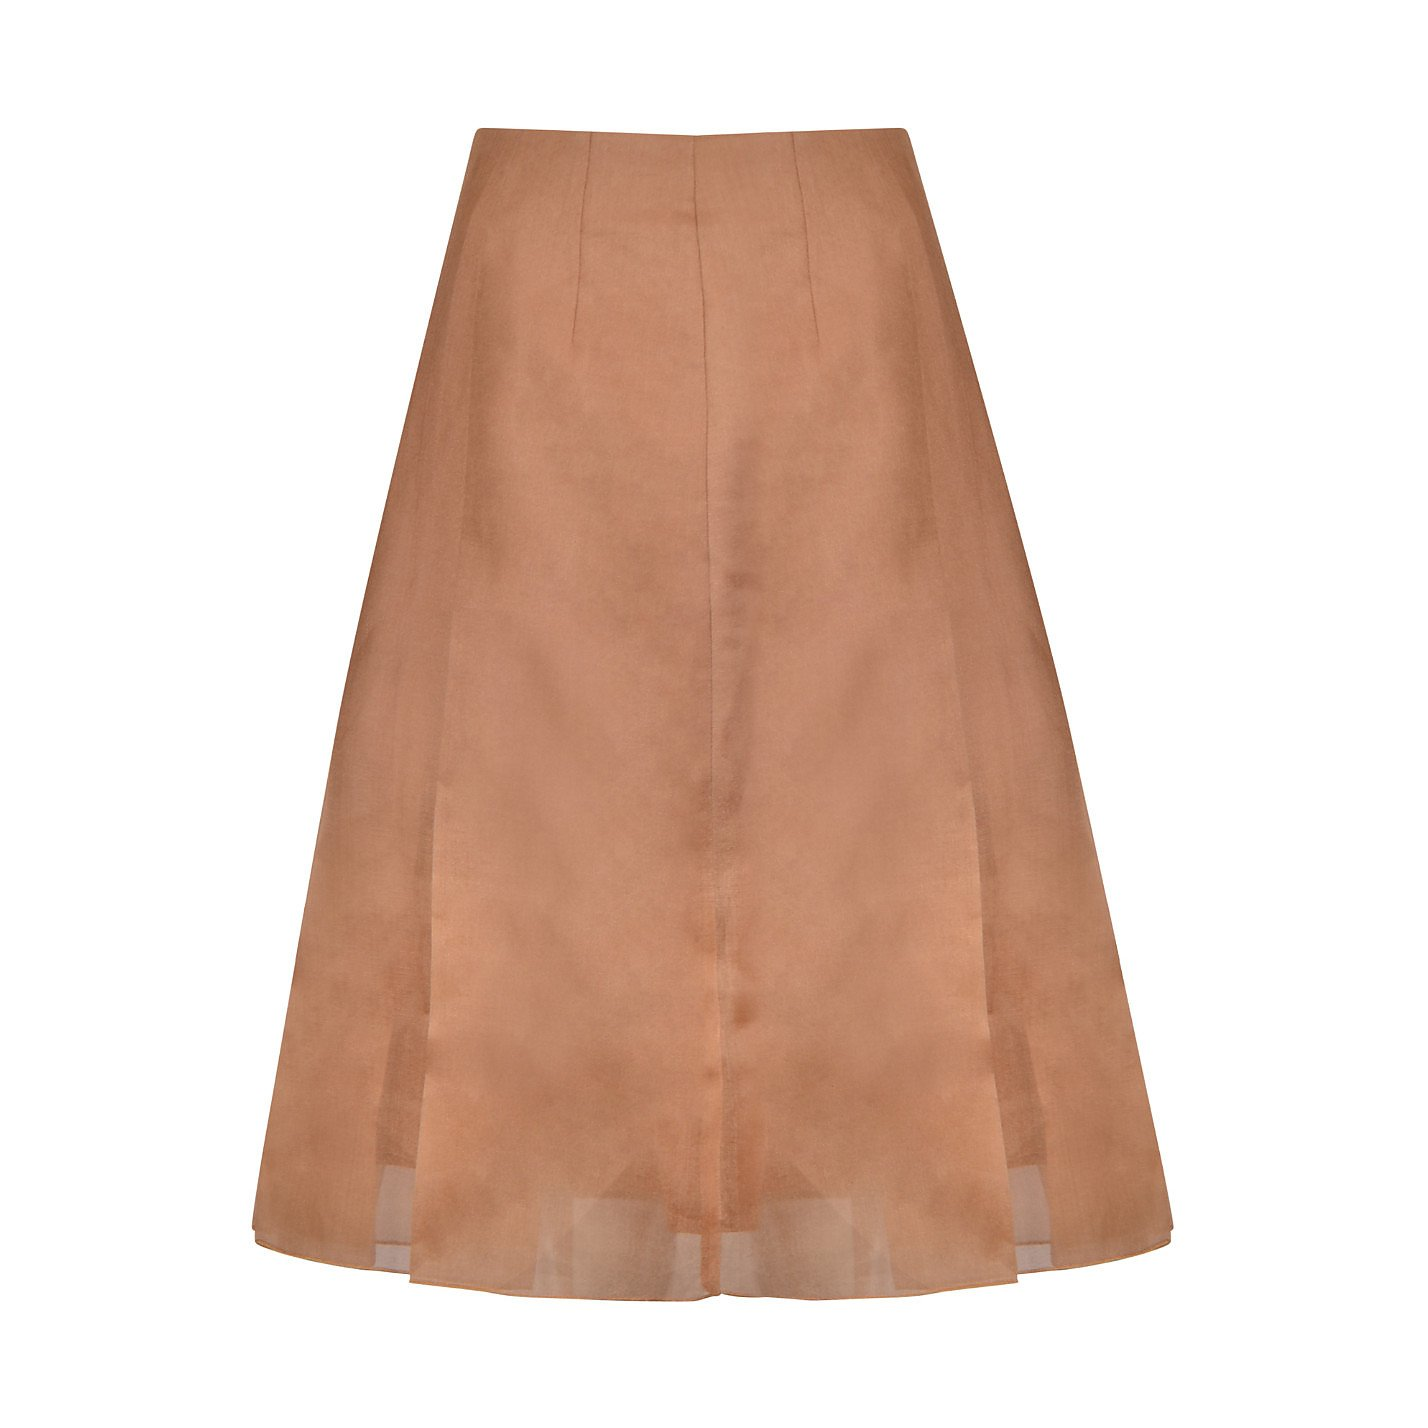 Dior A-Line Organza Skirt